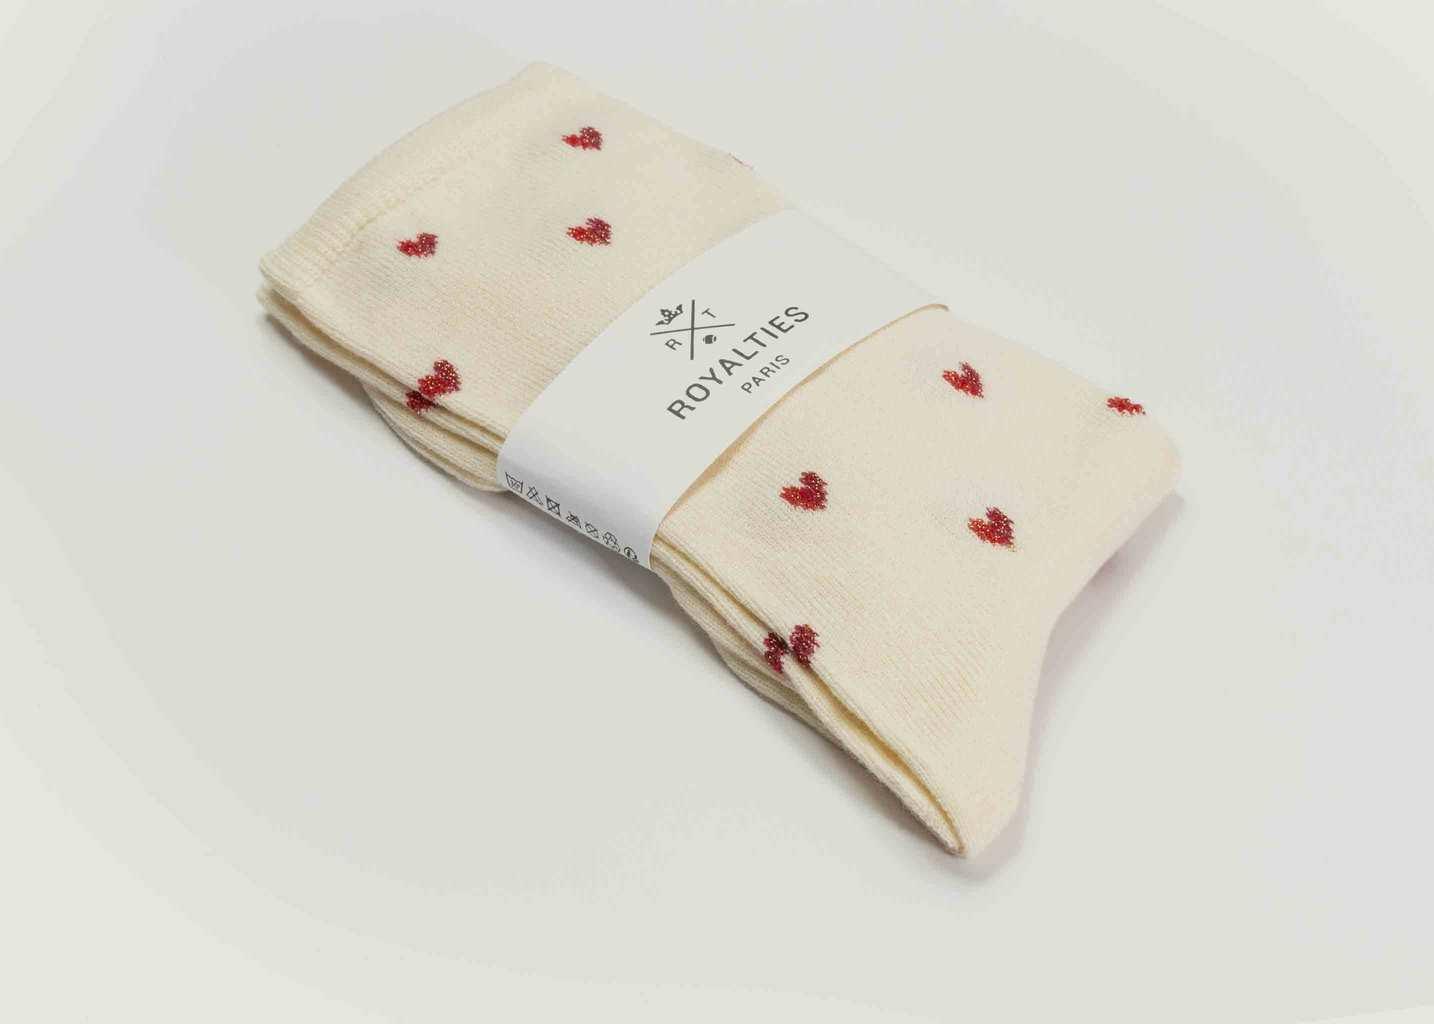 Chaussettes Love - Royalties